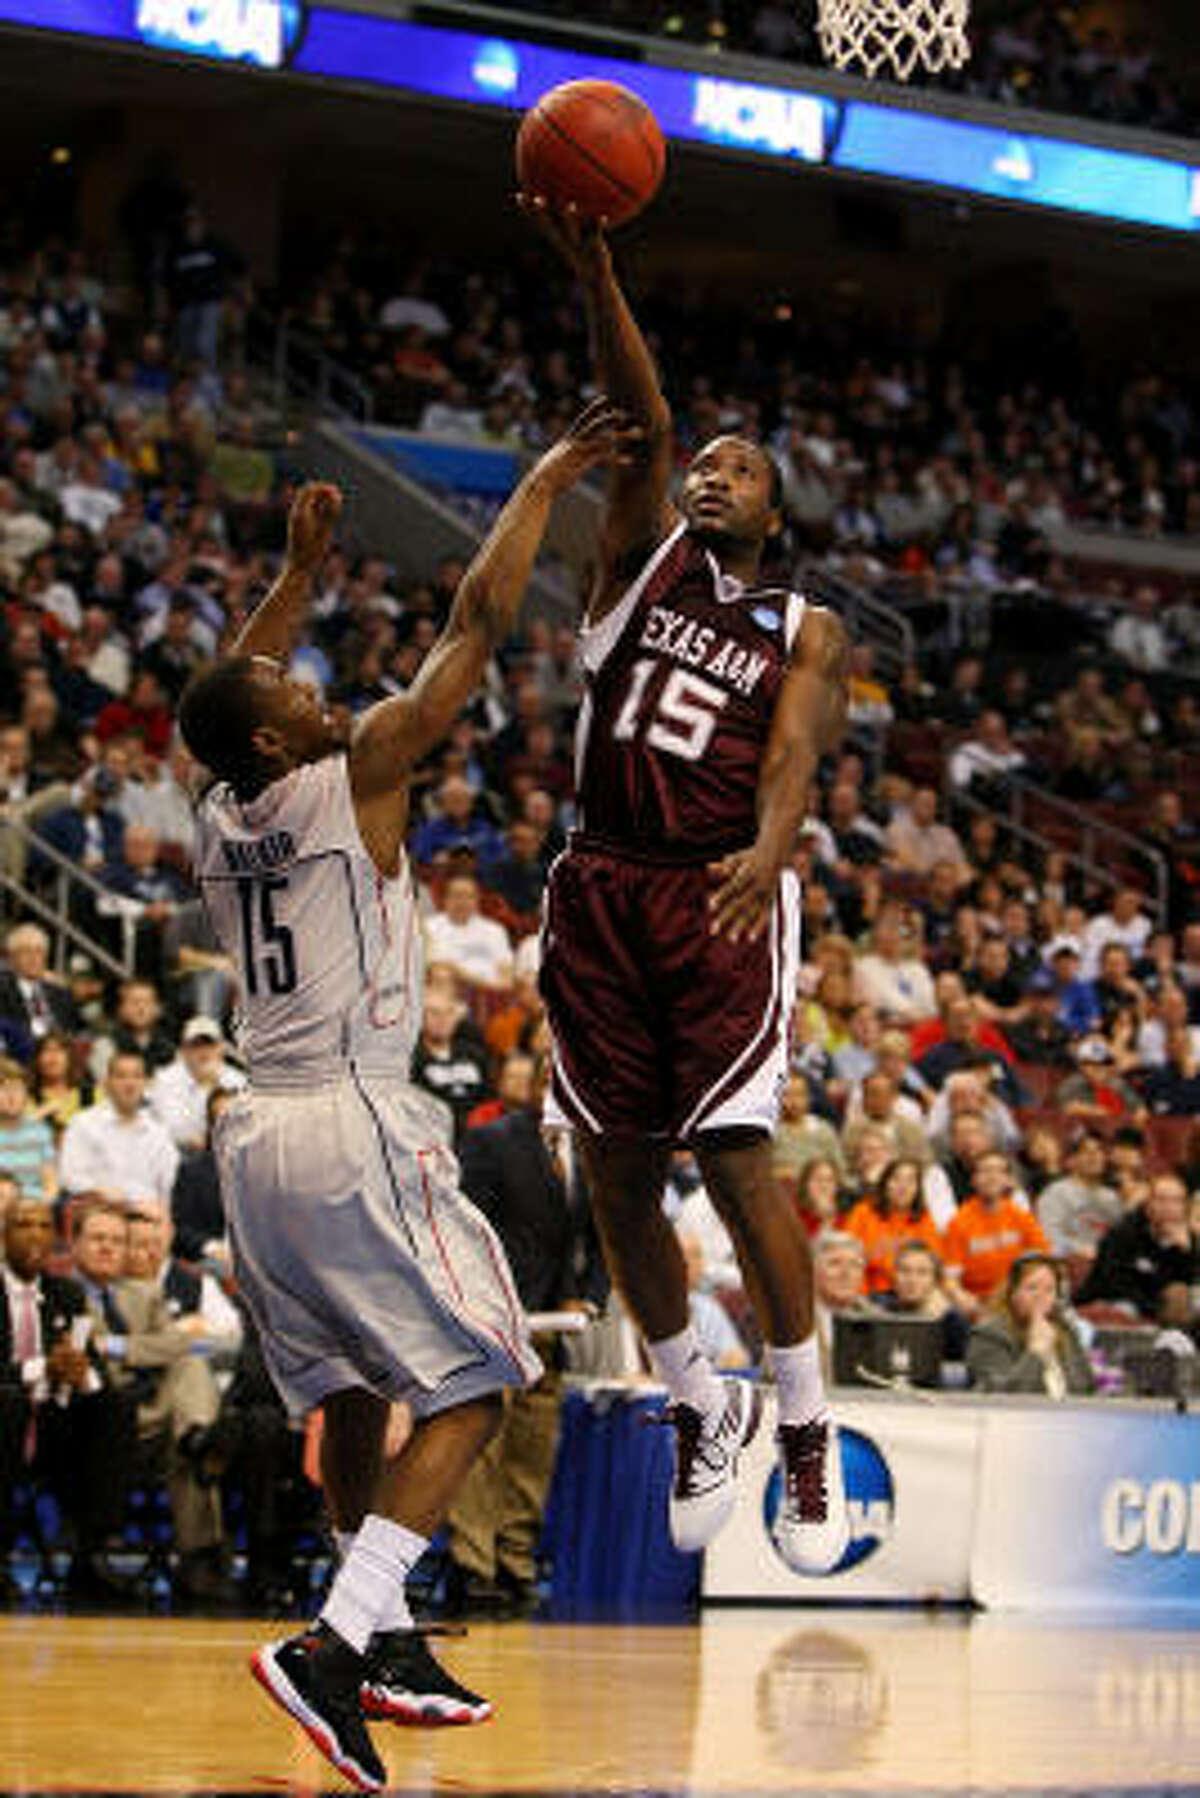 West Regional: Connecticut 92, Texas A&M 66 Texas A&M's Donald Sloan shoots against Kemba Walker.